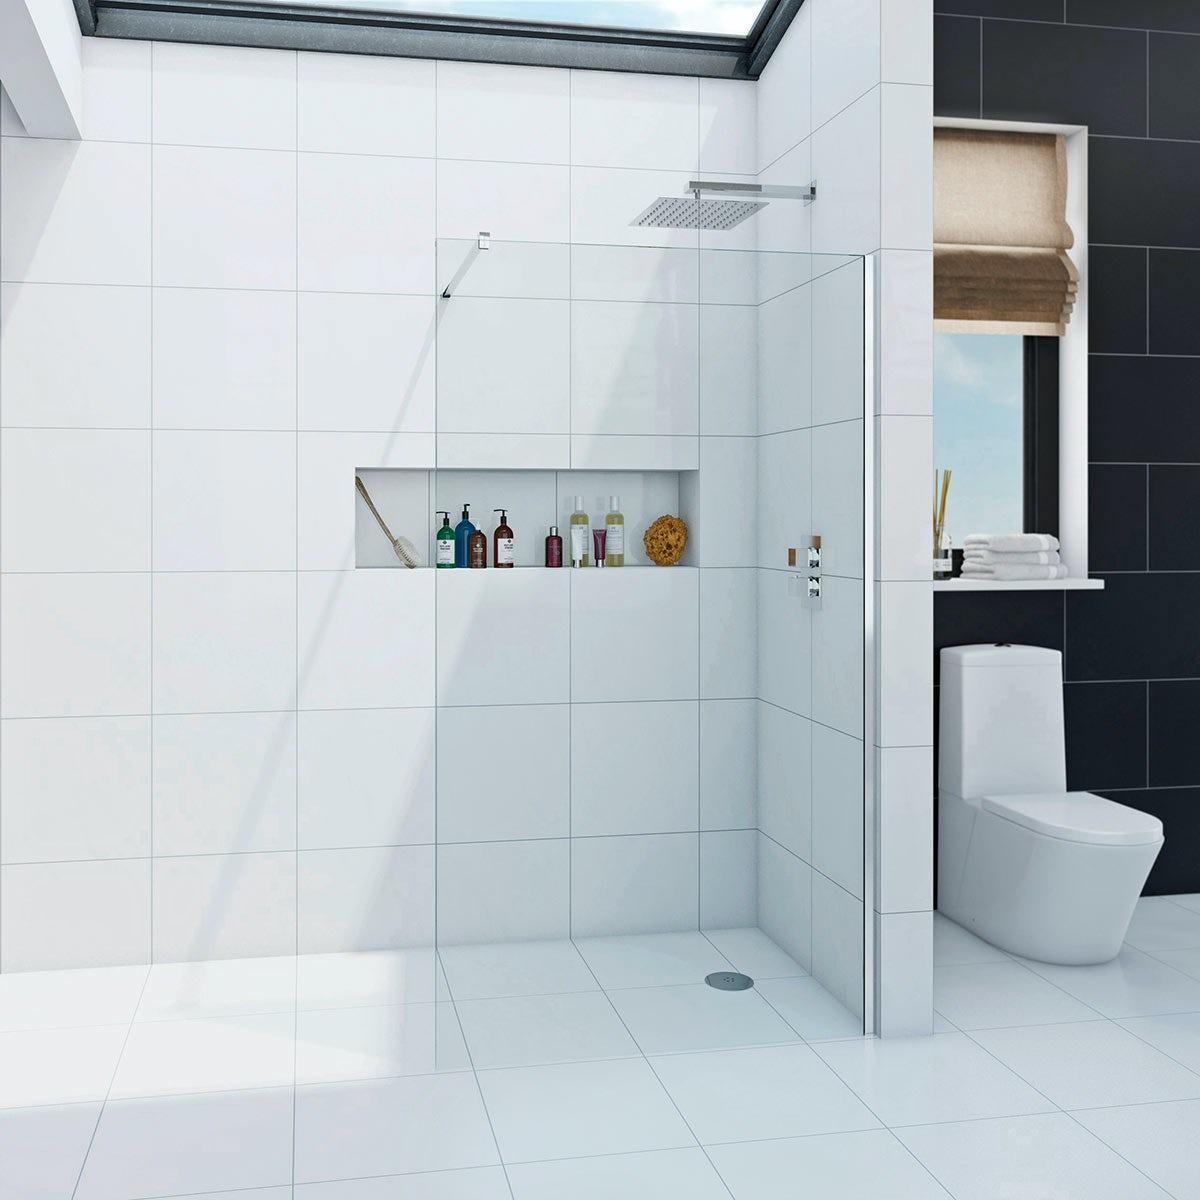 Wet Room Shower Tray  X Mm Tile On